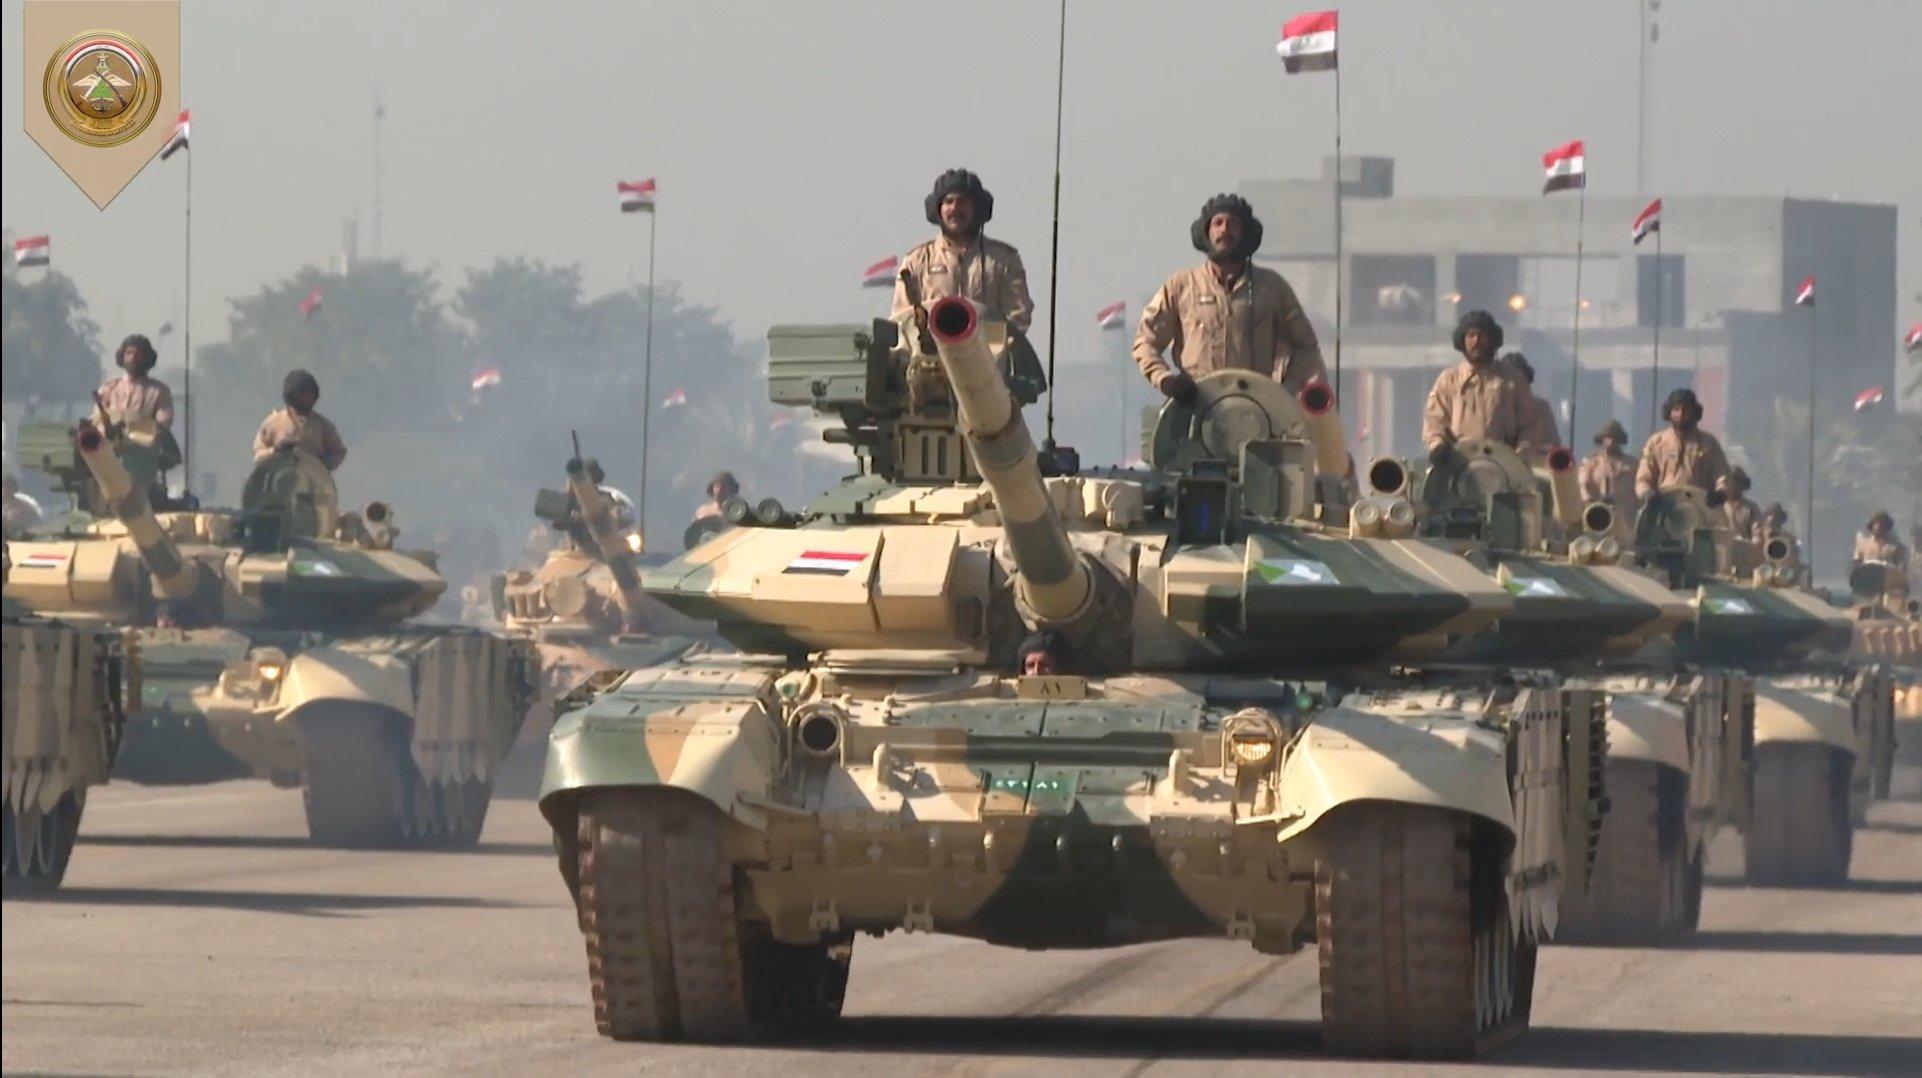 Armée Irakienne / Iraqi Armed Forces - Page 38 ErHtNQFXMAAAUUR?format=jpg&name=large